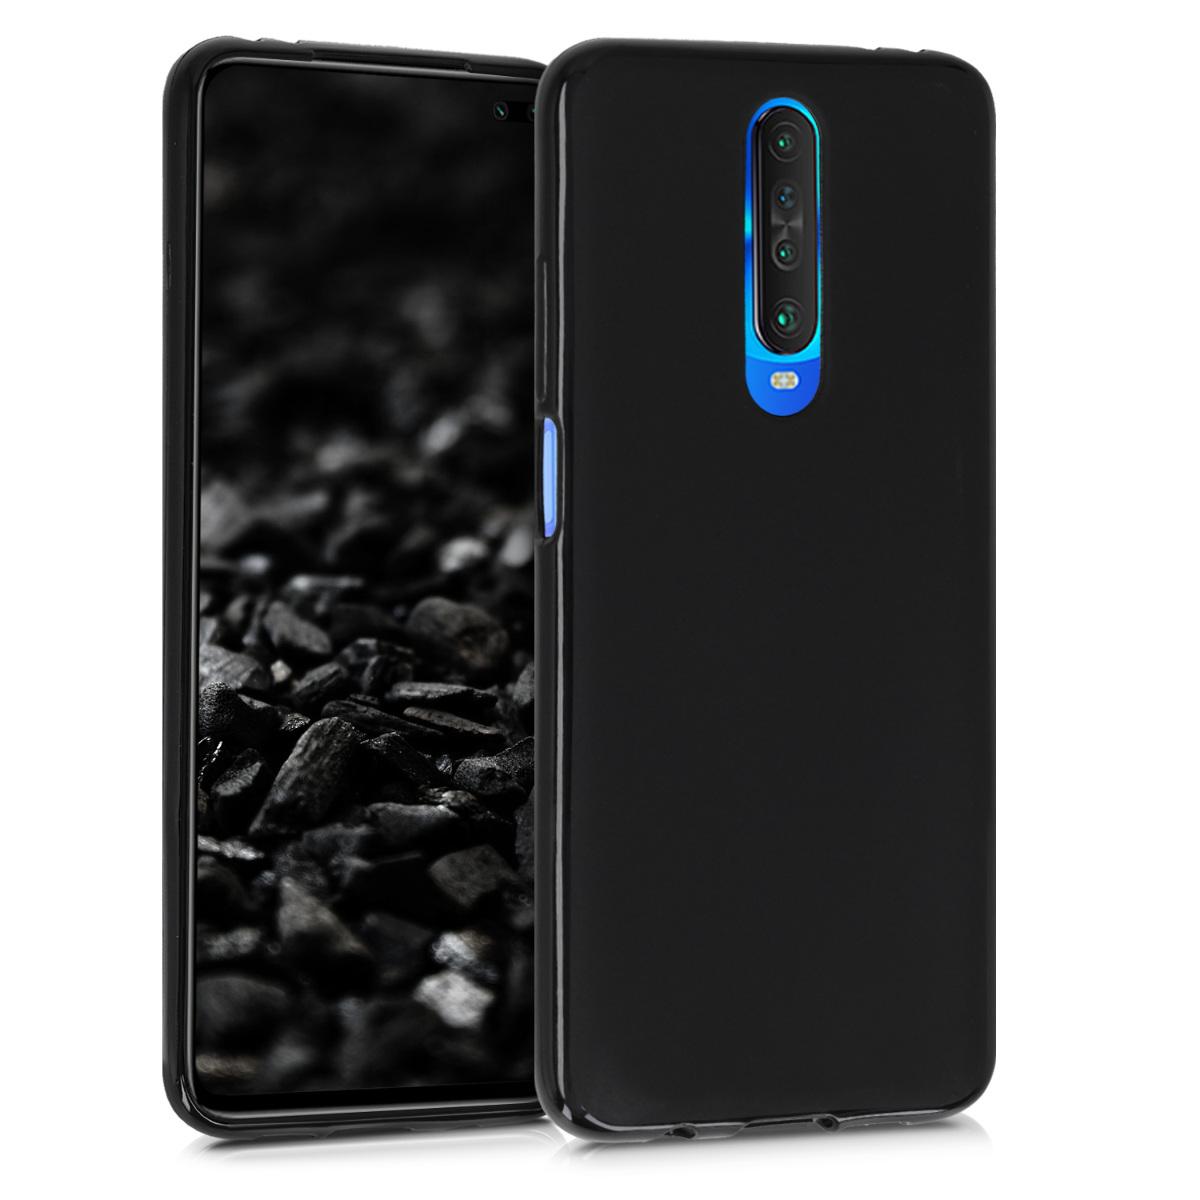 Kvalitní silikonové TPU pouzdro | obal pro Xiaomi Redmi K30 - černý matný